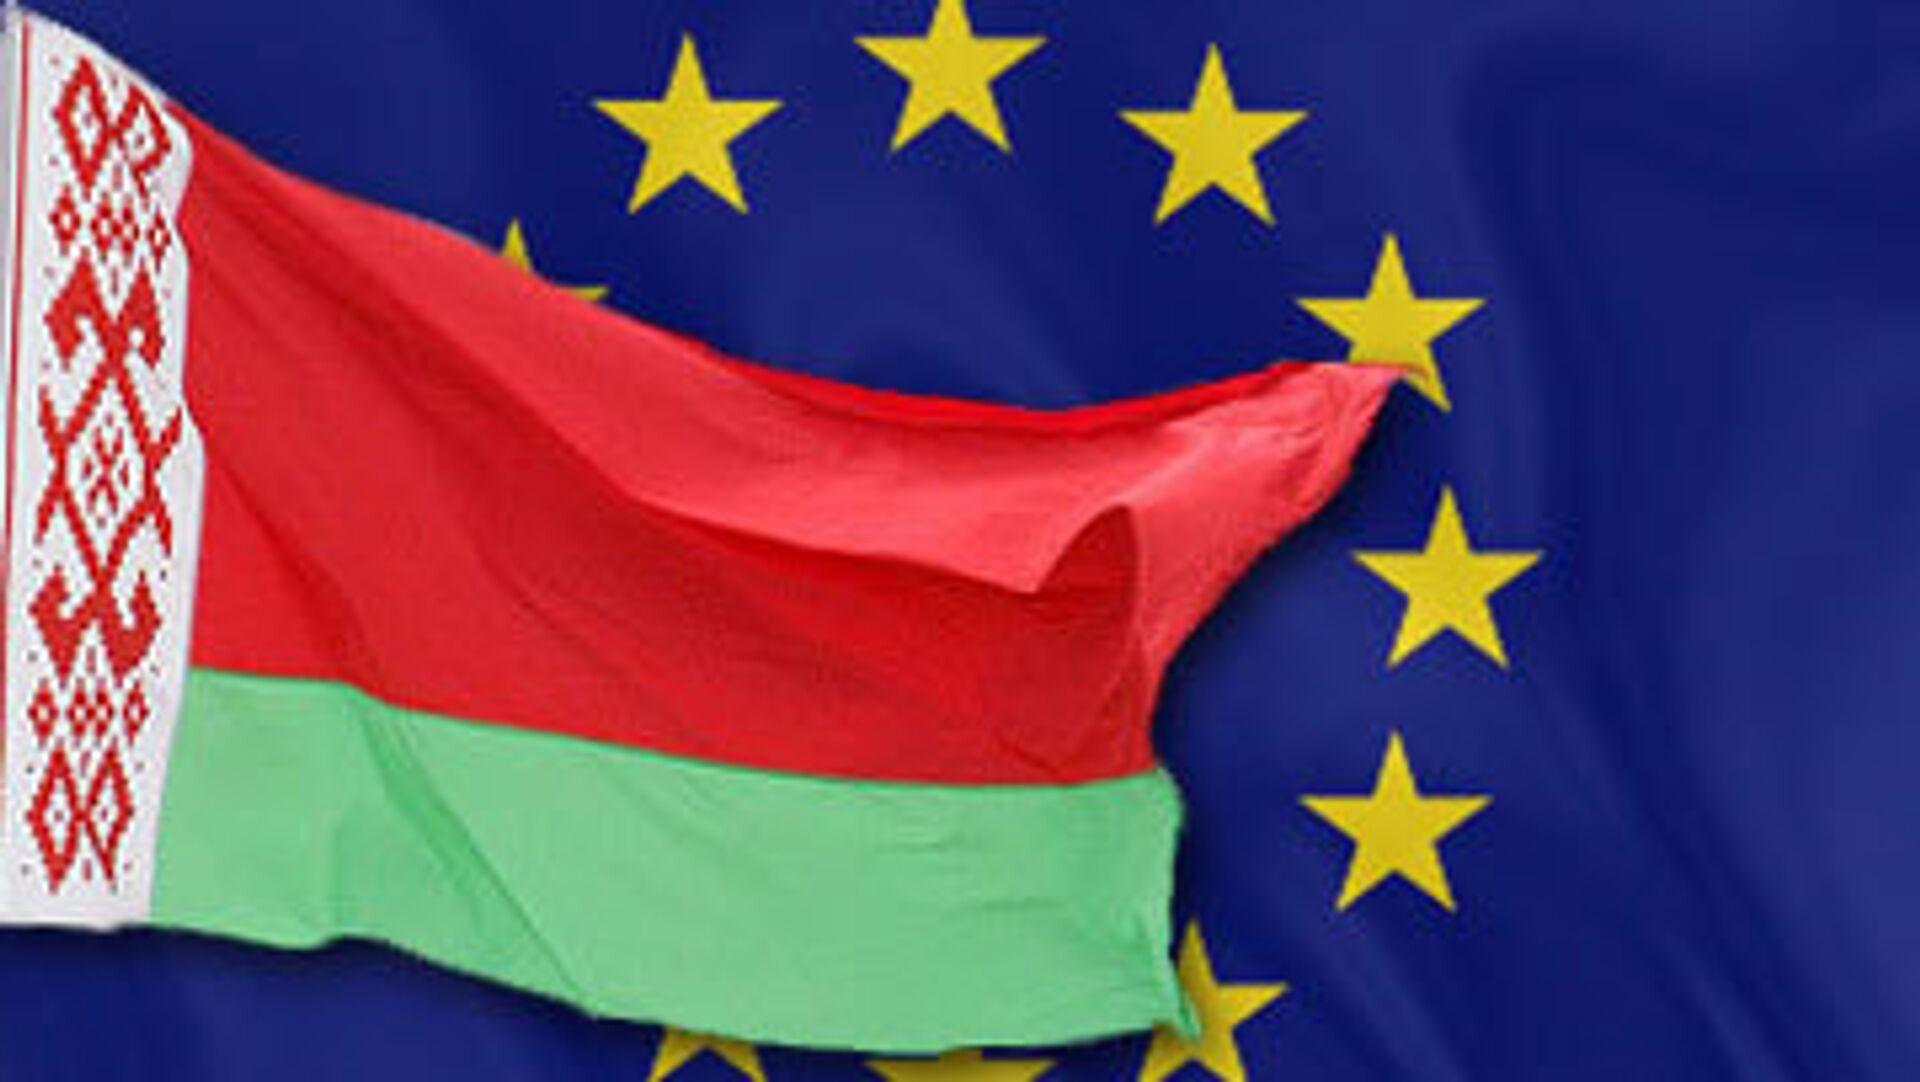 Флаг ЕС и Белоруссии - РИА Новости, 1920, 24.06.2021